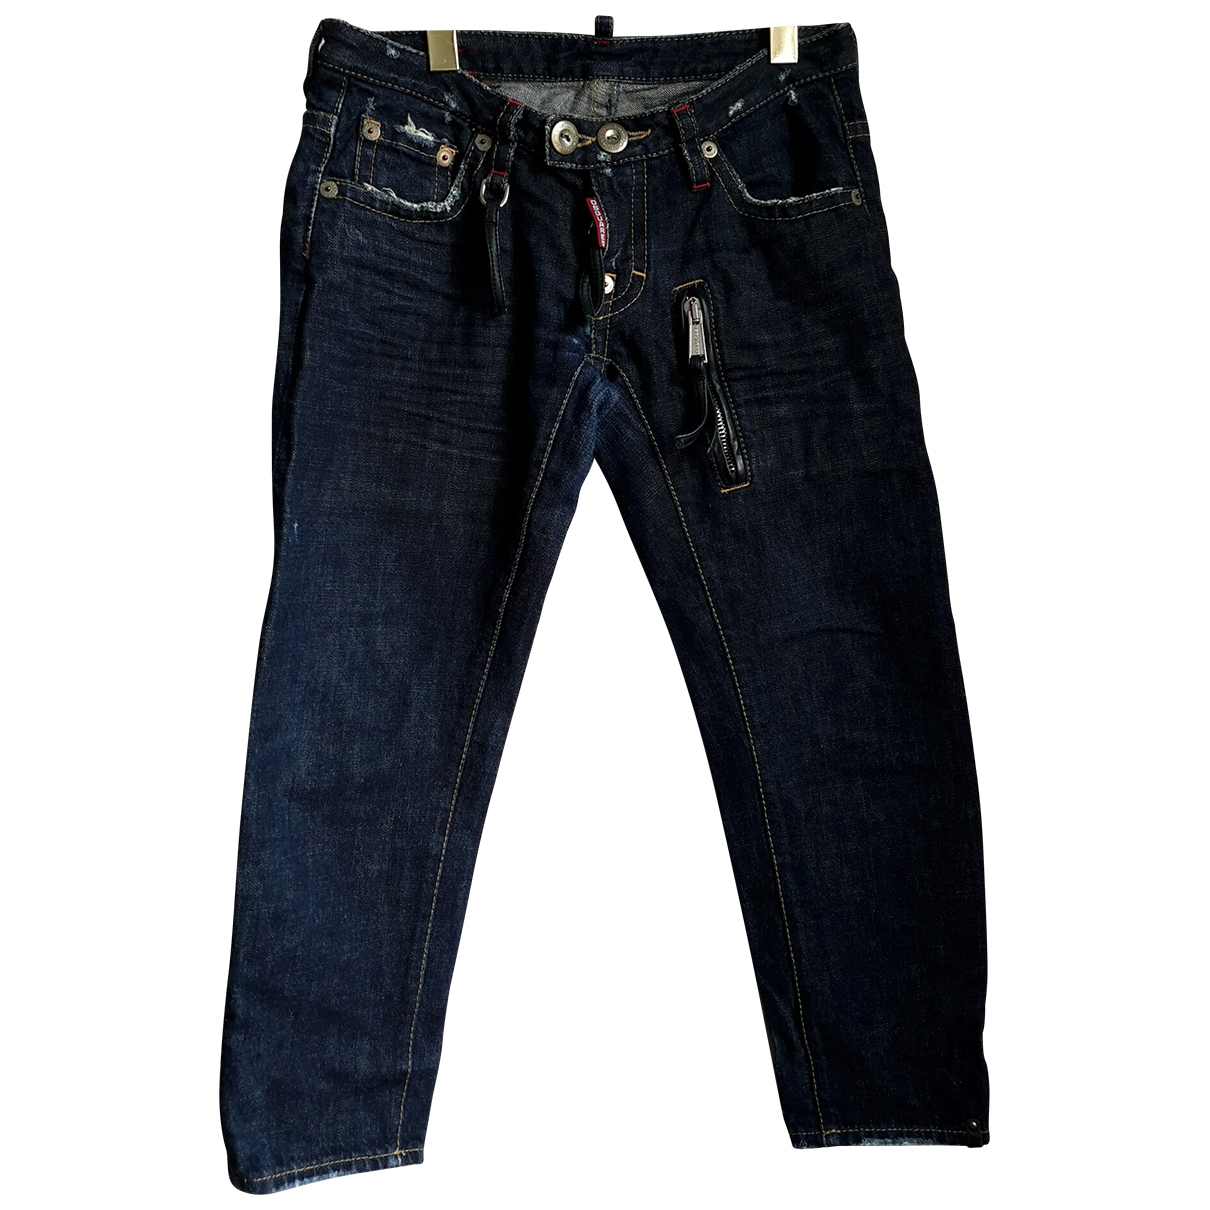 Dsquared2 \N Blue Denim - Jeans Trousers for Women 40 IT